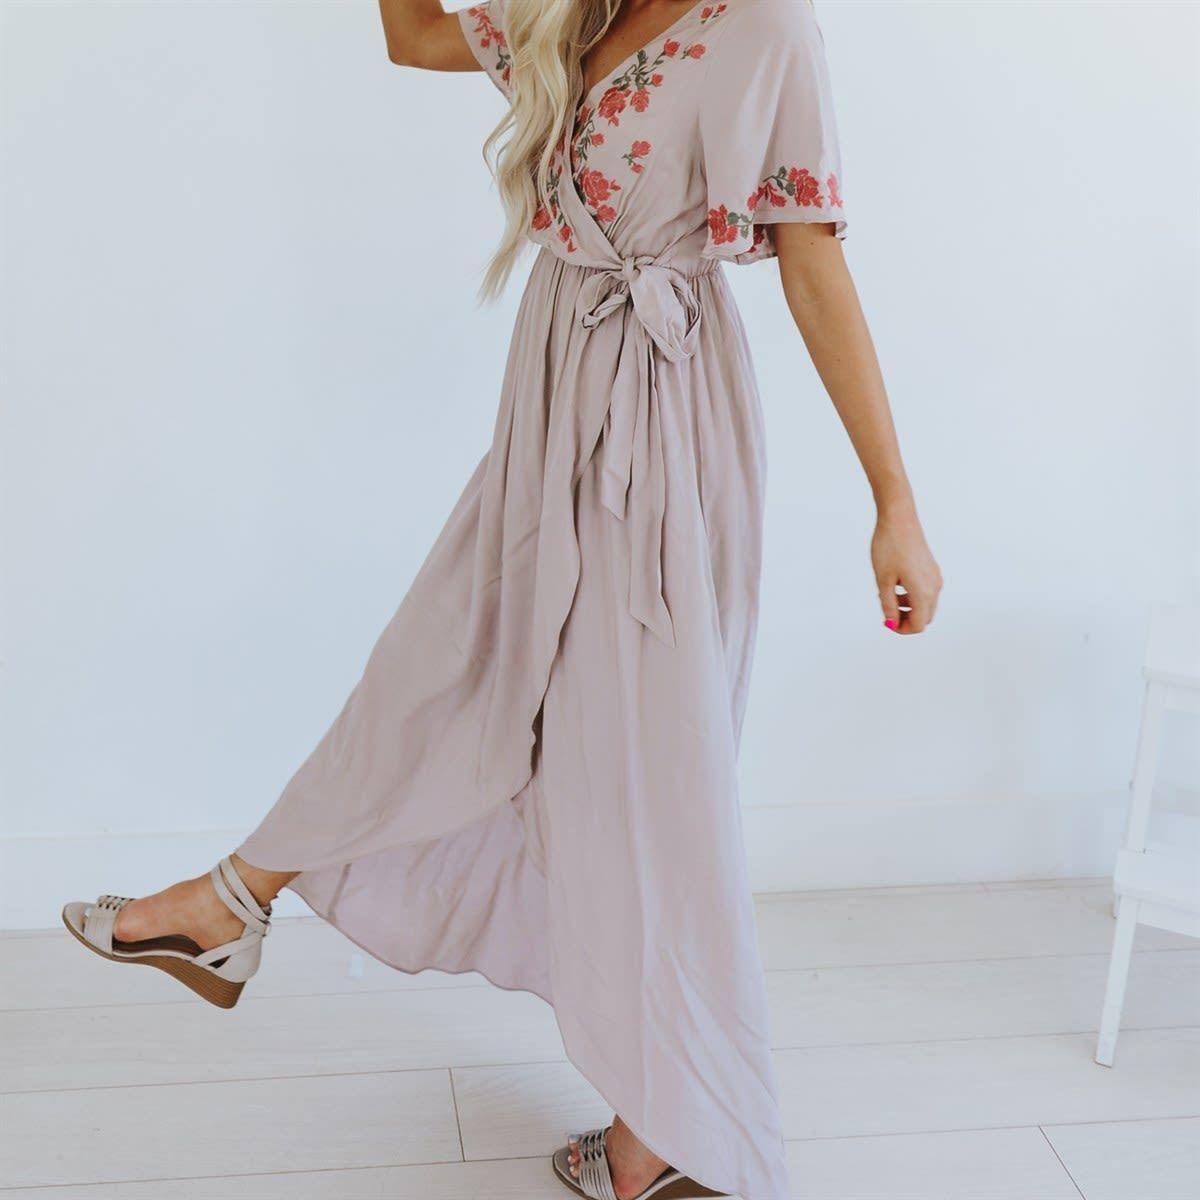 Embroidered Floral Faux Wrap Dress Nursing Friendly Wrap Dress Dresses Faux Wrap Dress [ 1200 x 1200 Pixel ]